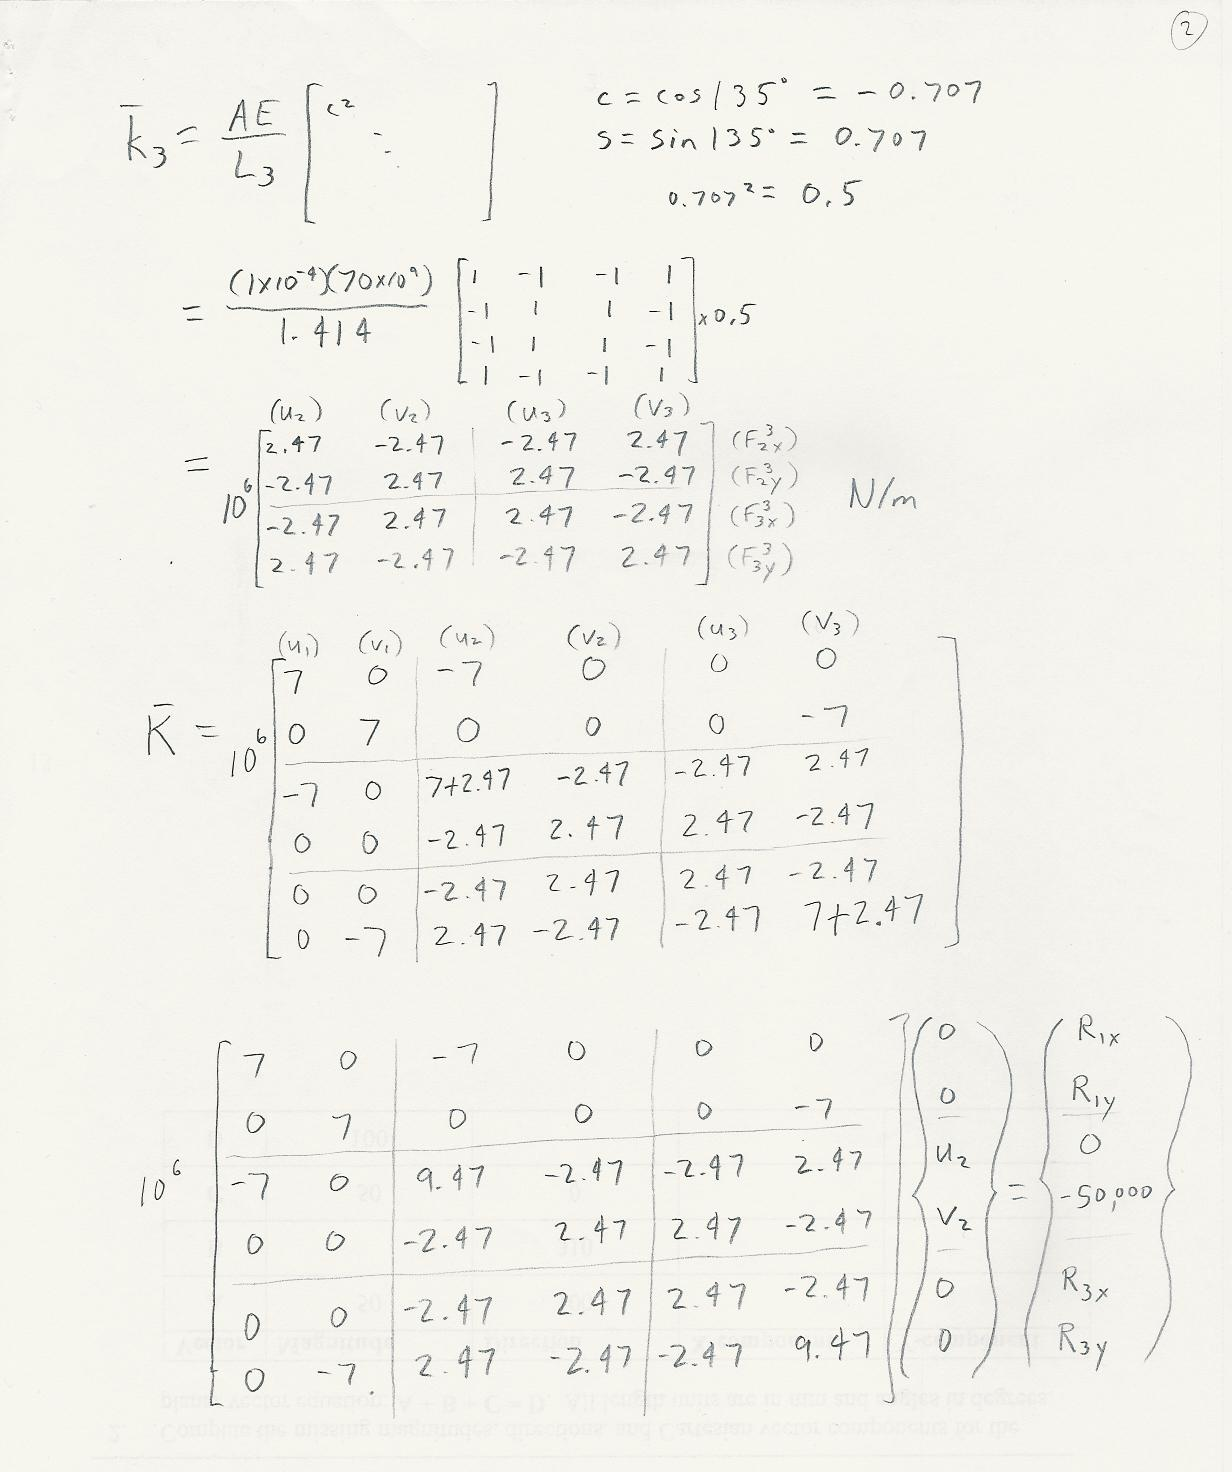 homework example 2 p 15 The study of homework and other examples by alfie kohn  p 127 7 alfie kohn,  example 2: in muhlenbruck et.